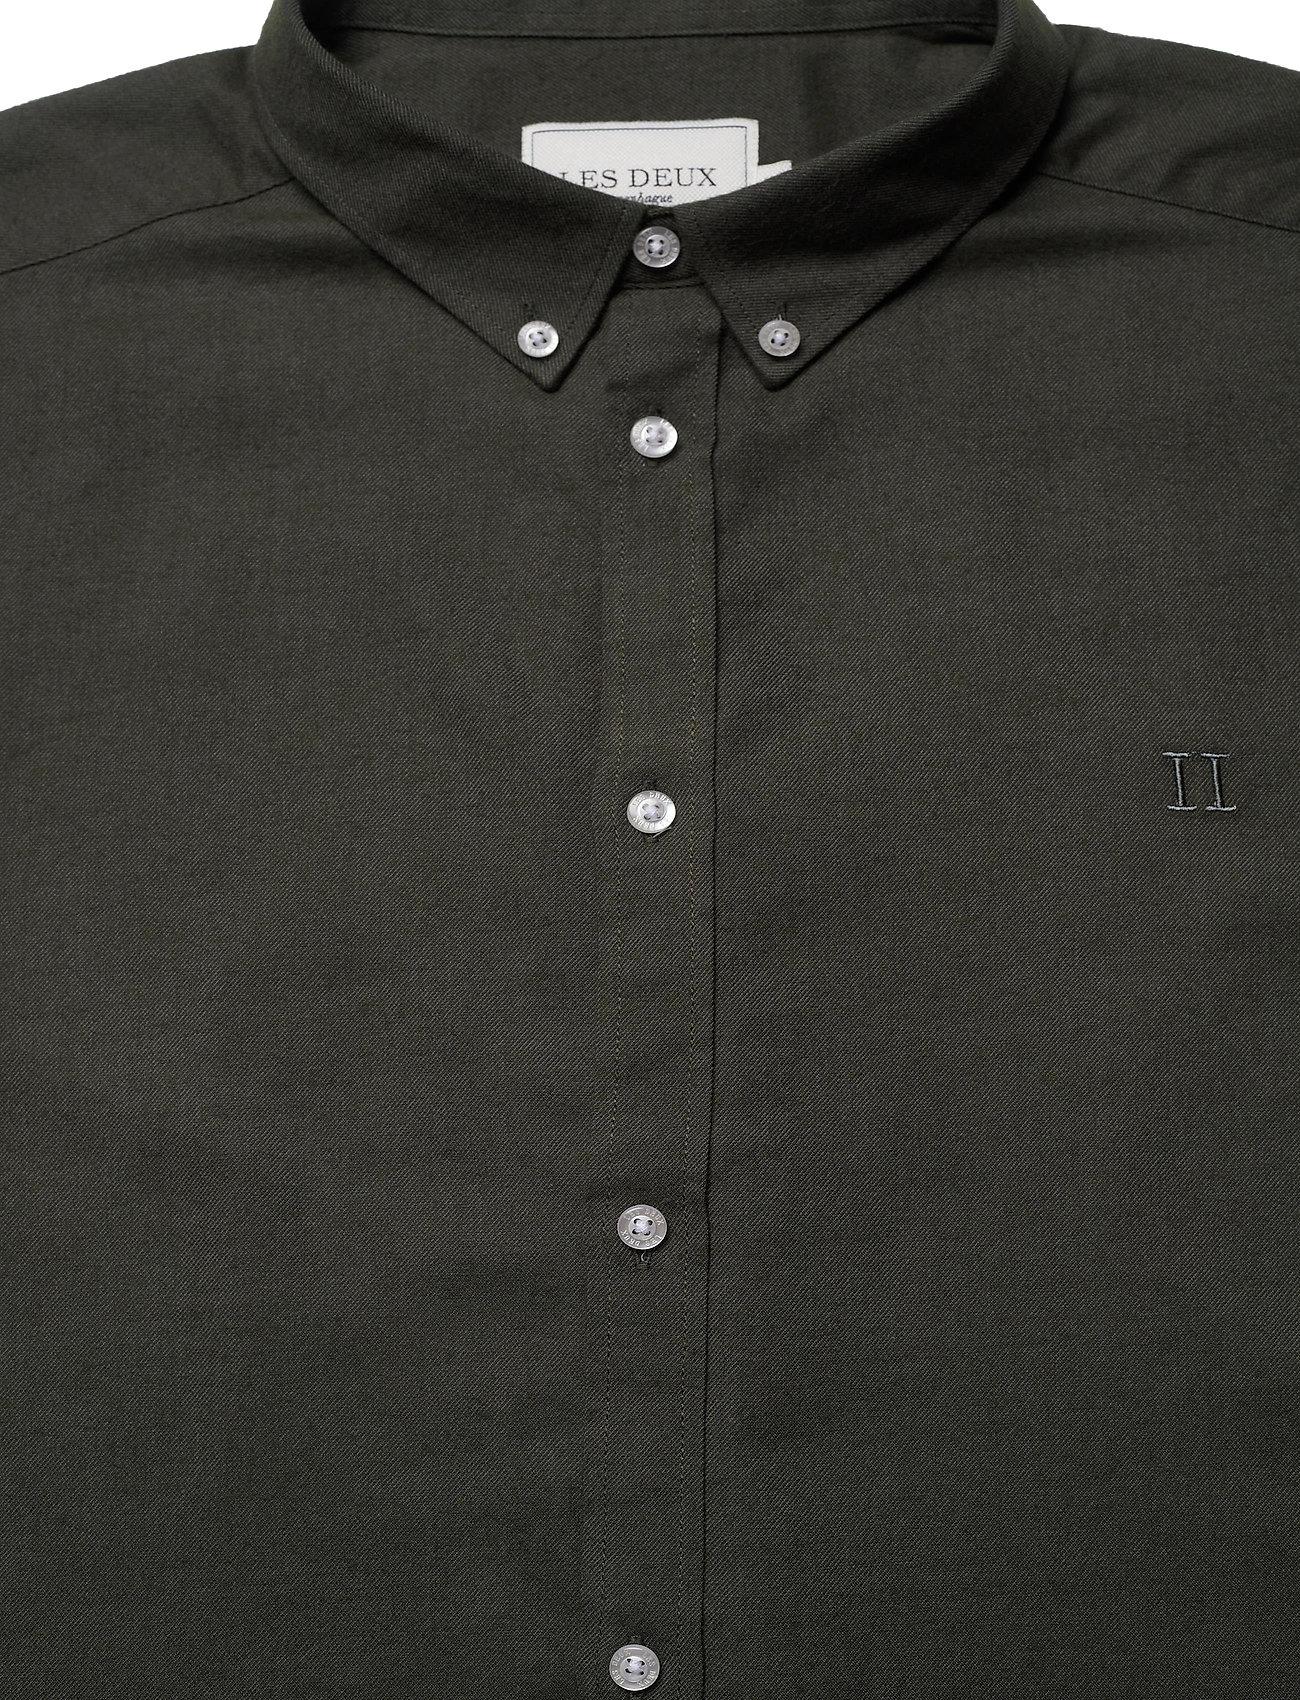 Les Deux Harrison B.D. Brushed Shirt - Skjorter DEEP FORREST - Menn Klær